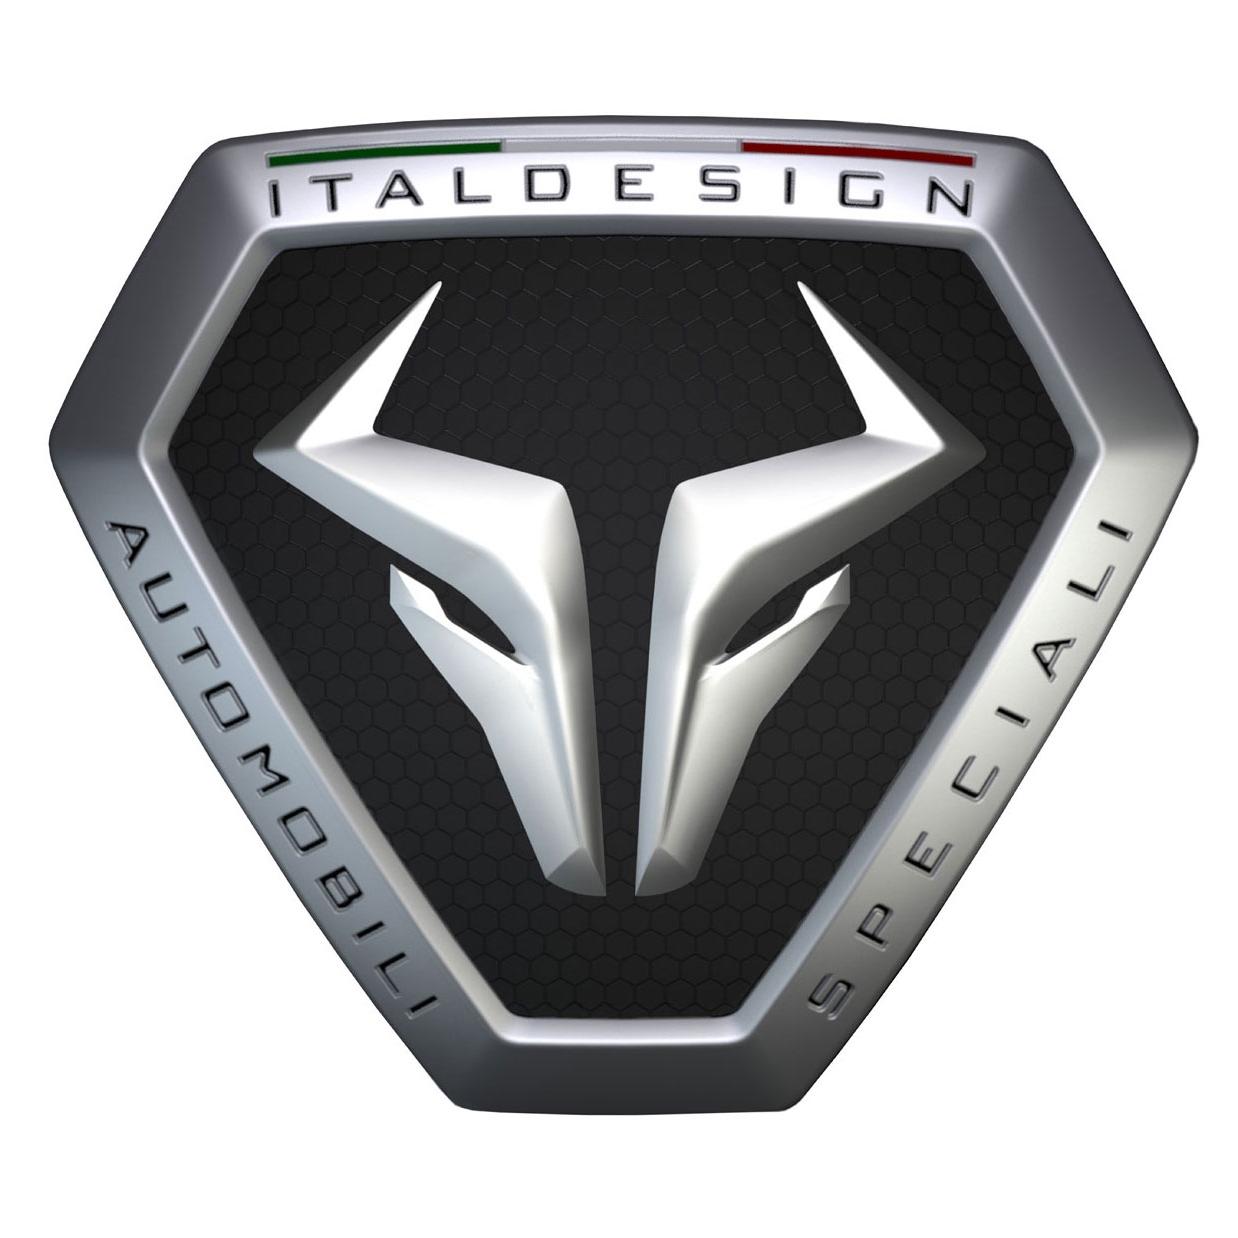 Italdesign-Automobili-Speciali-Logo.jpg